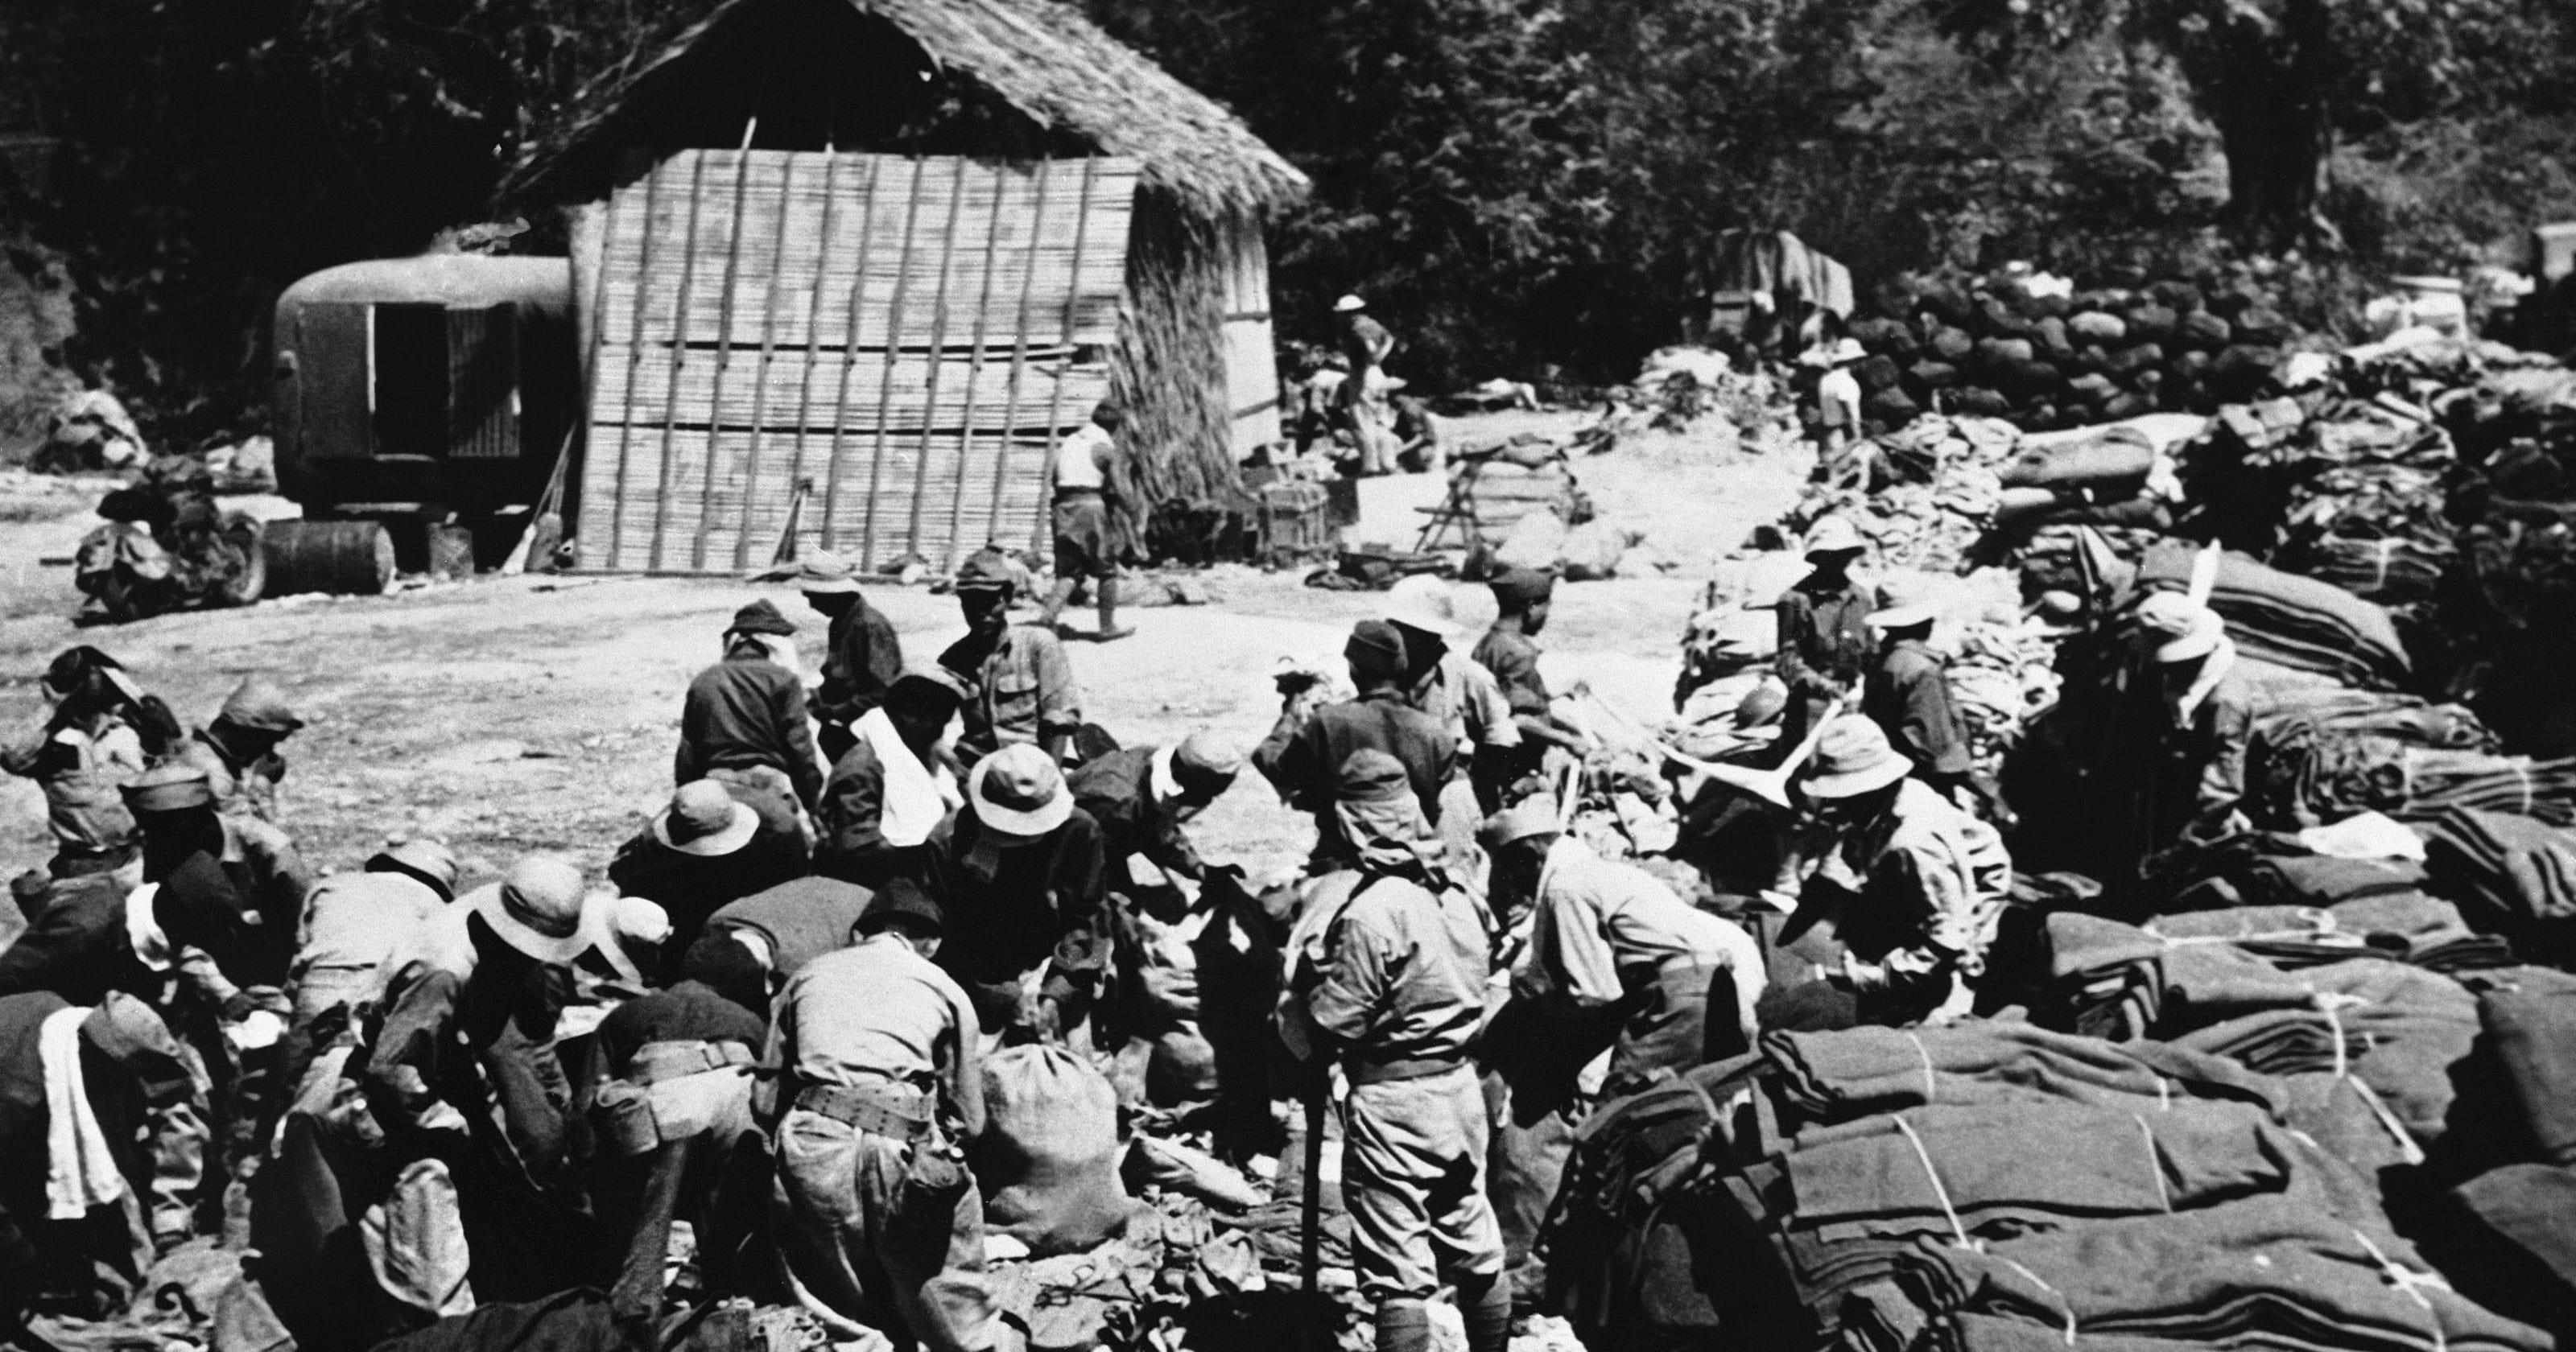 james regions remember our world war ii veterans sacrifices